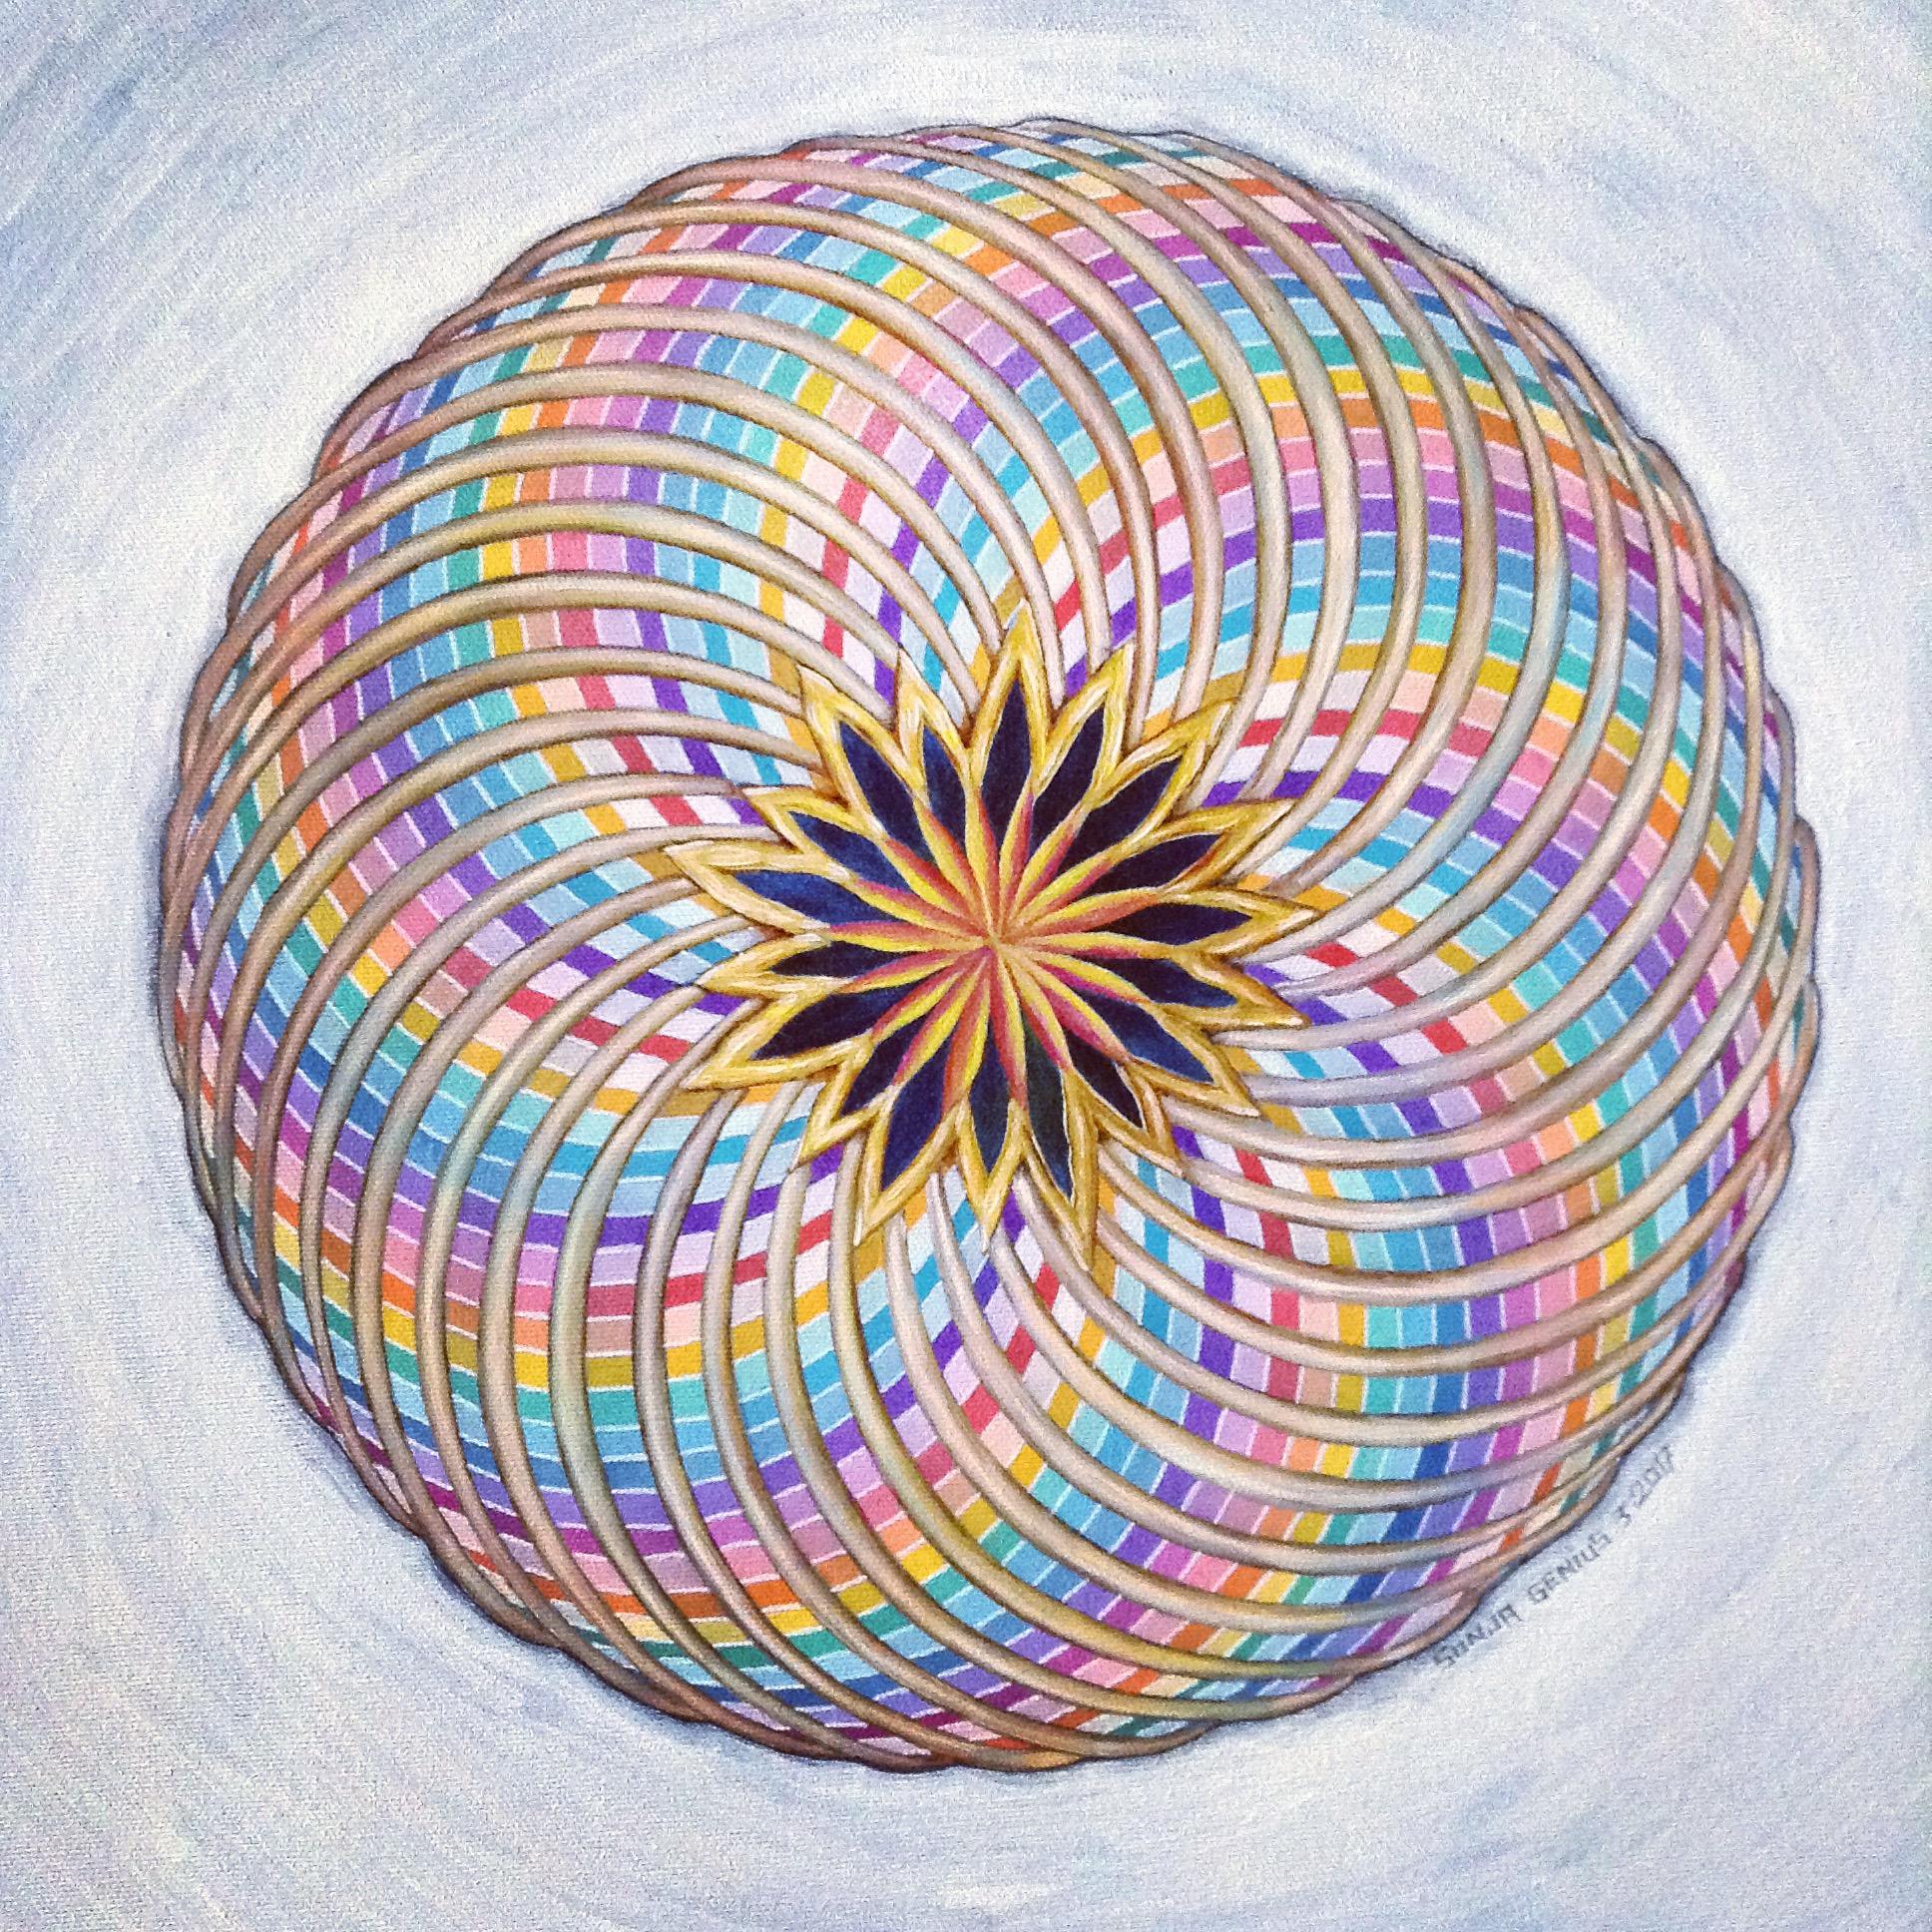 Torus, oil on canvas 16x16, March 2017 (4)